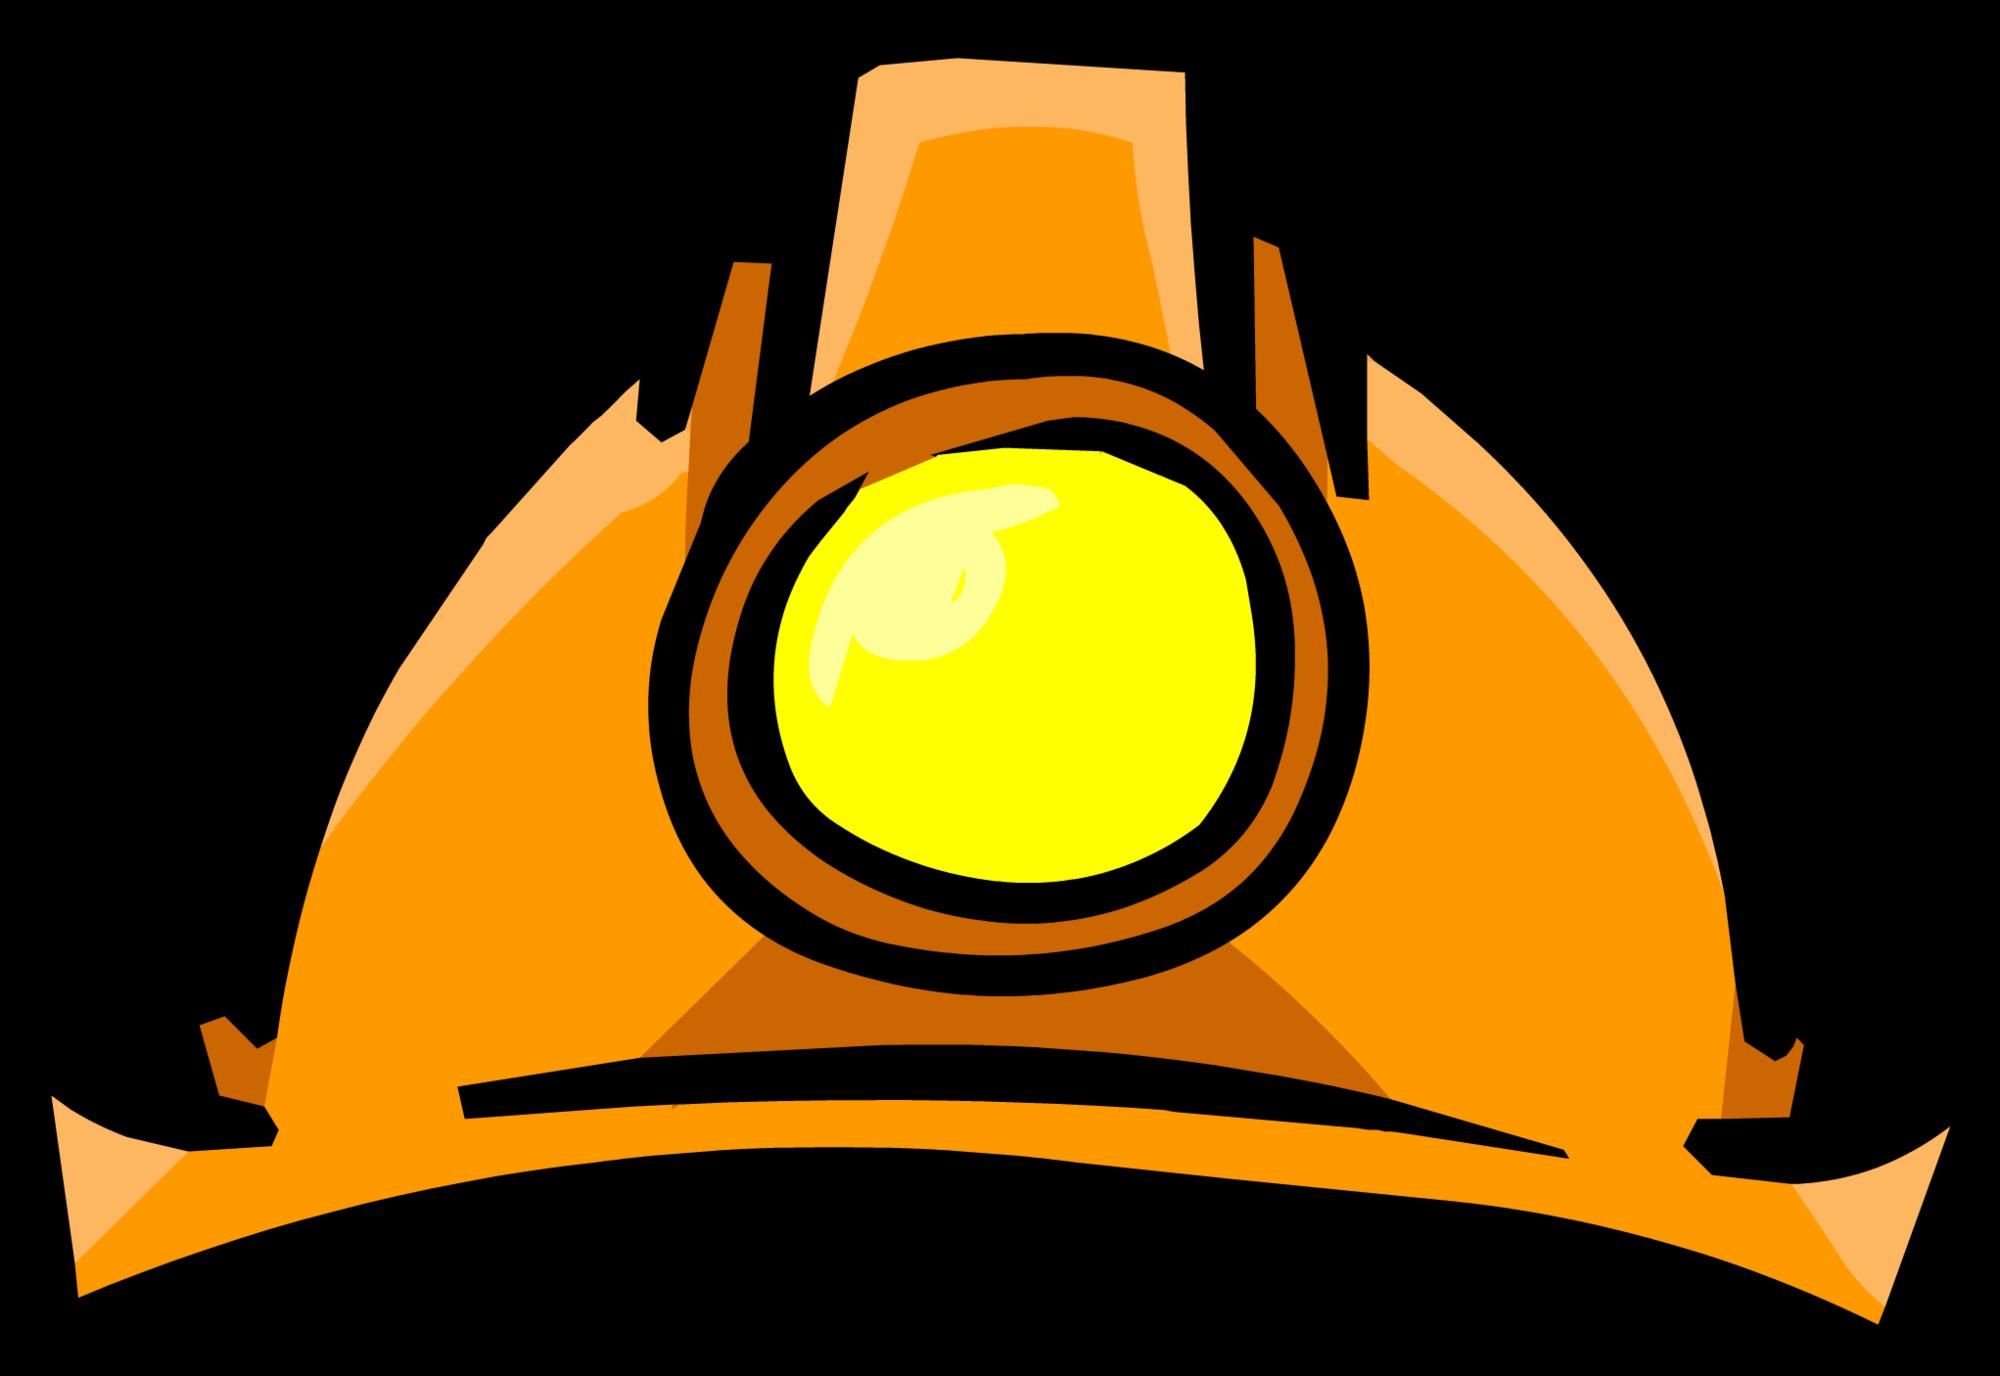 Mining clipart mining drill. Miners helmet club penguin